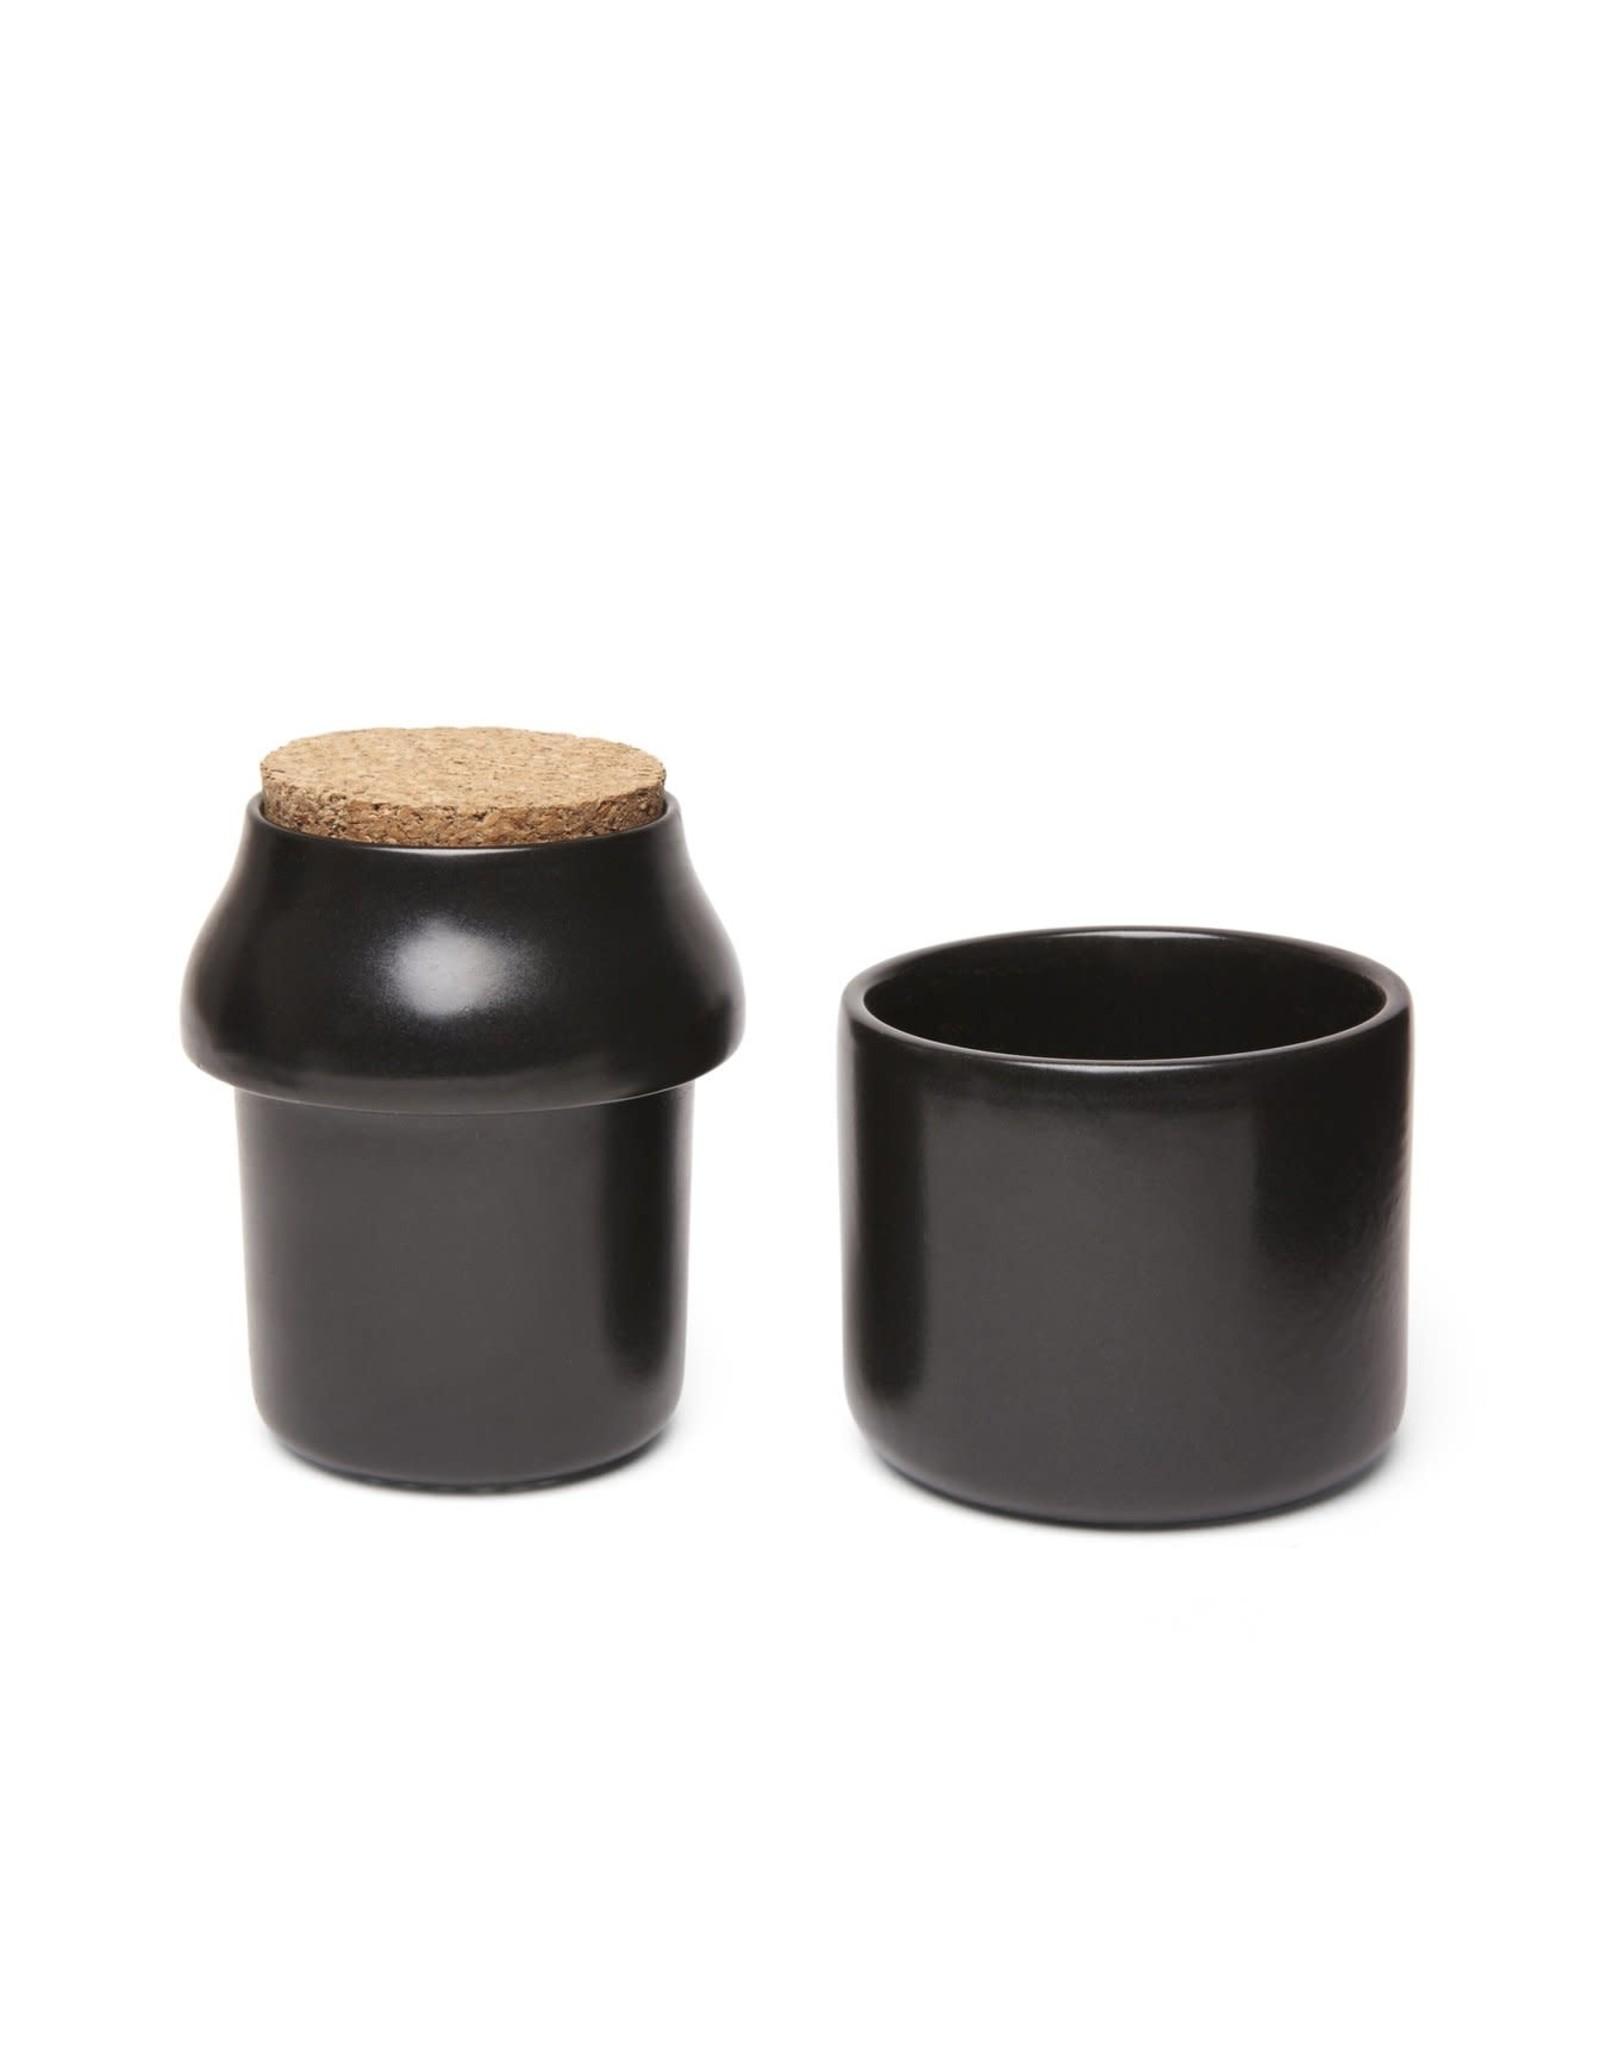 KIK Large Ceramic Grinder & Jar in Black